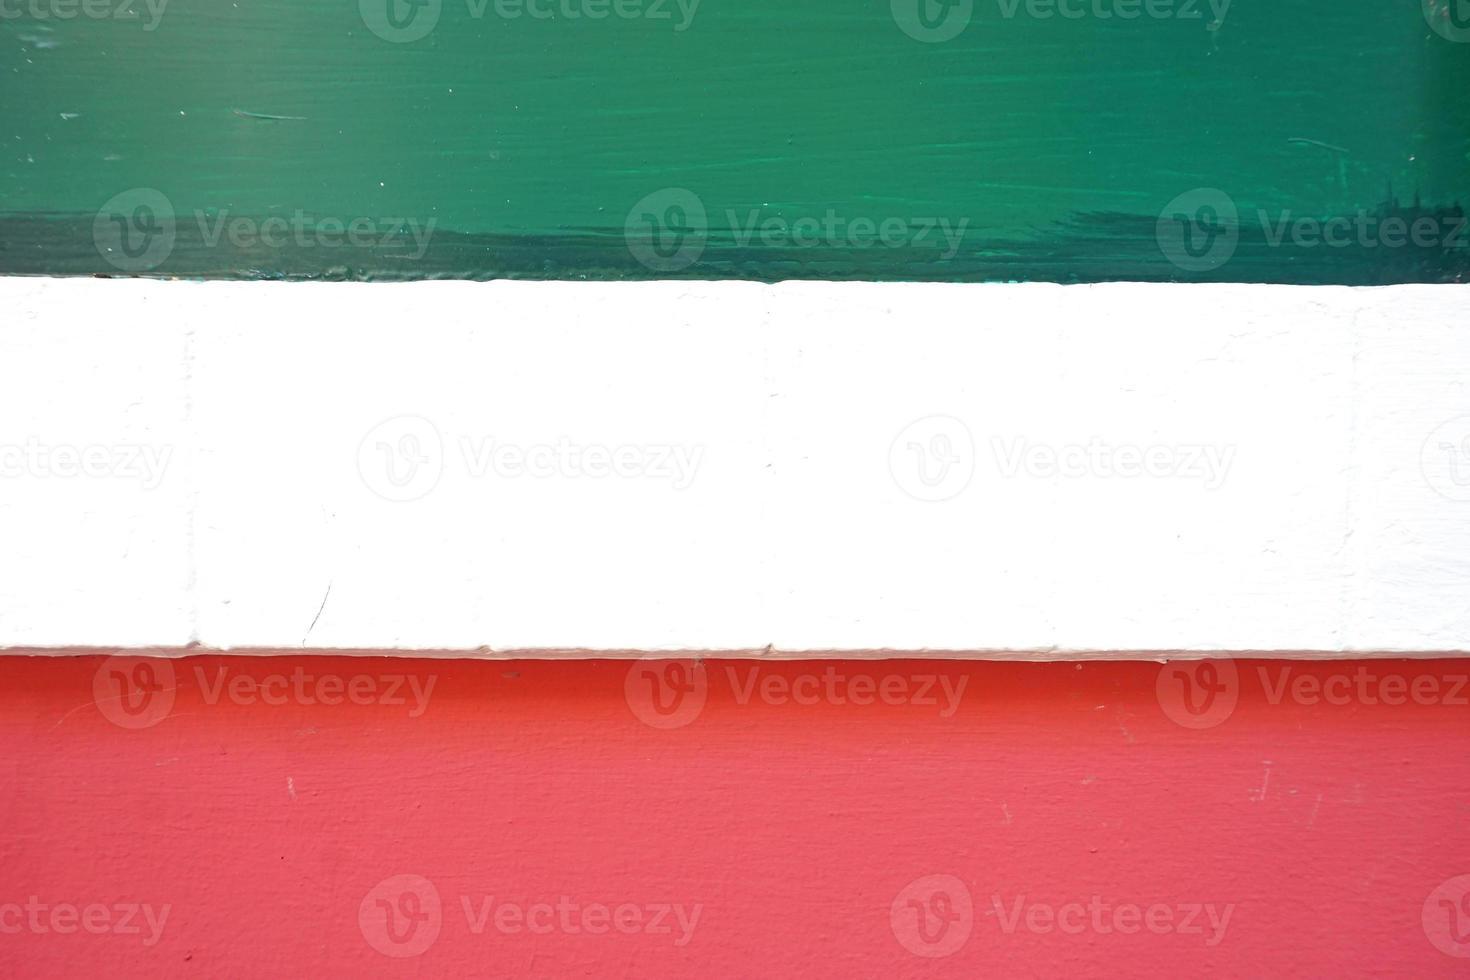 färgglad träbakgrund foto